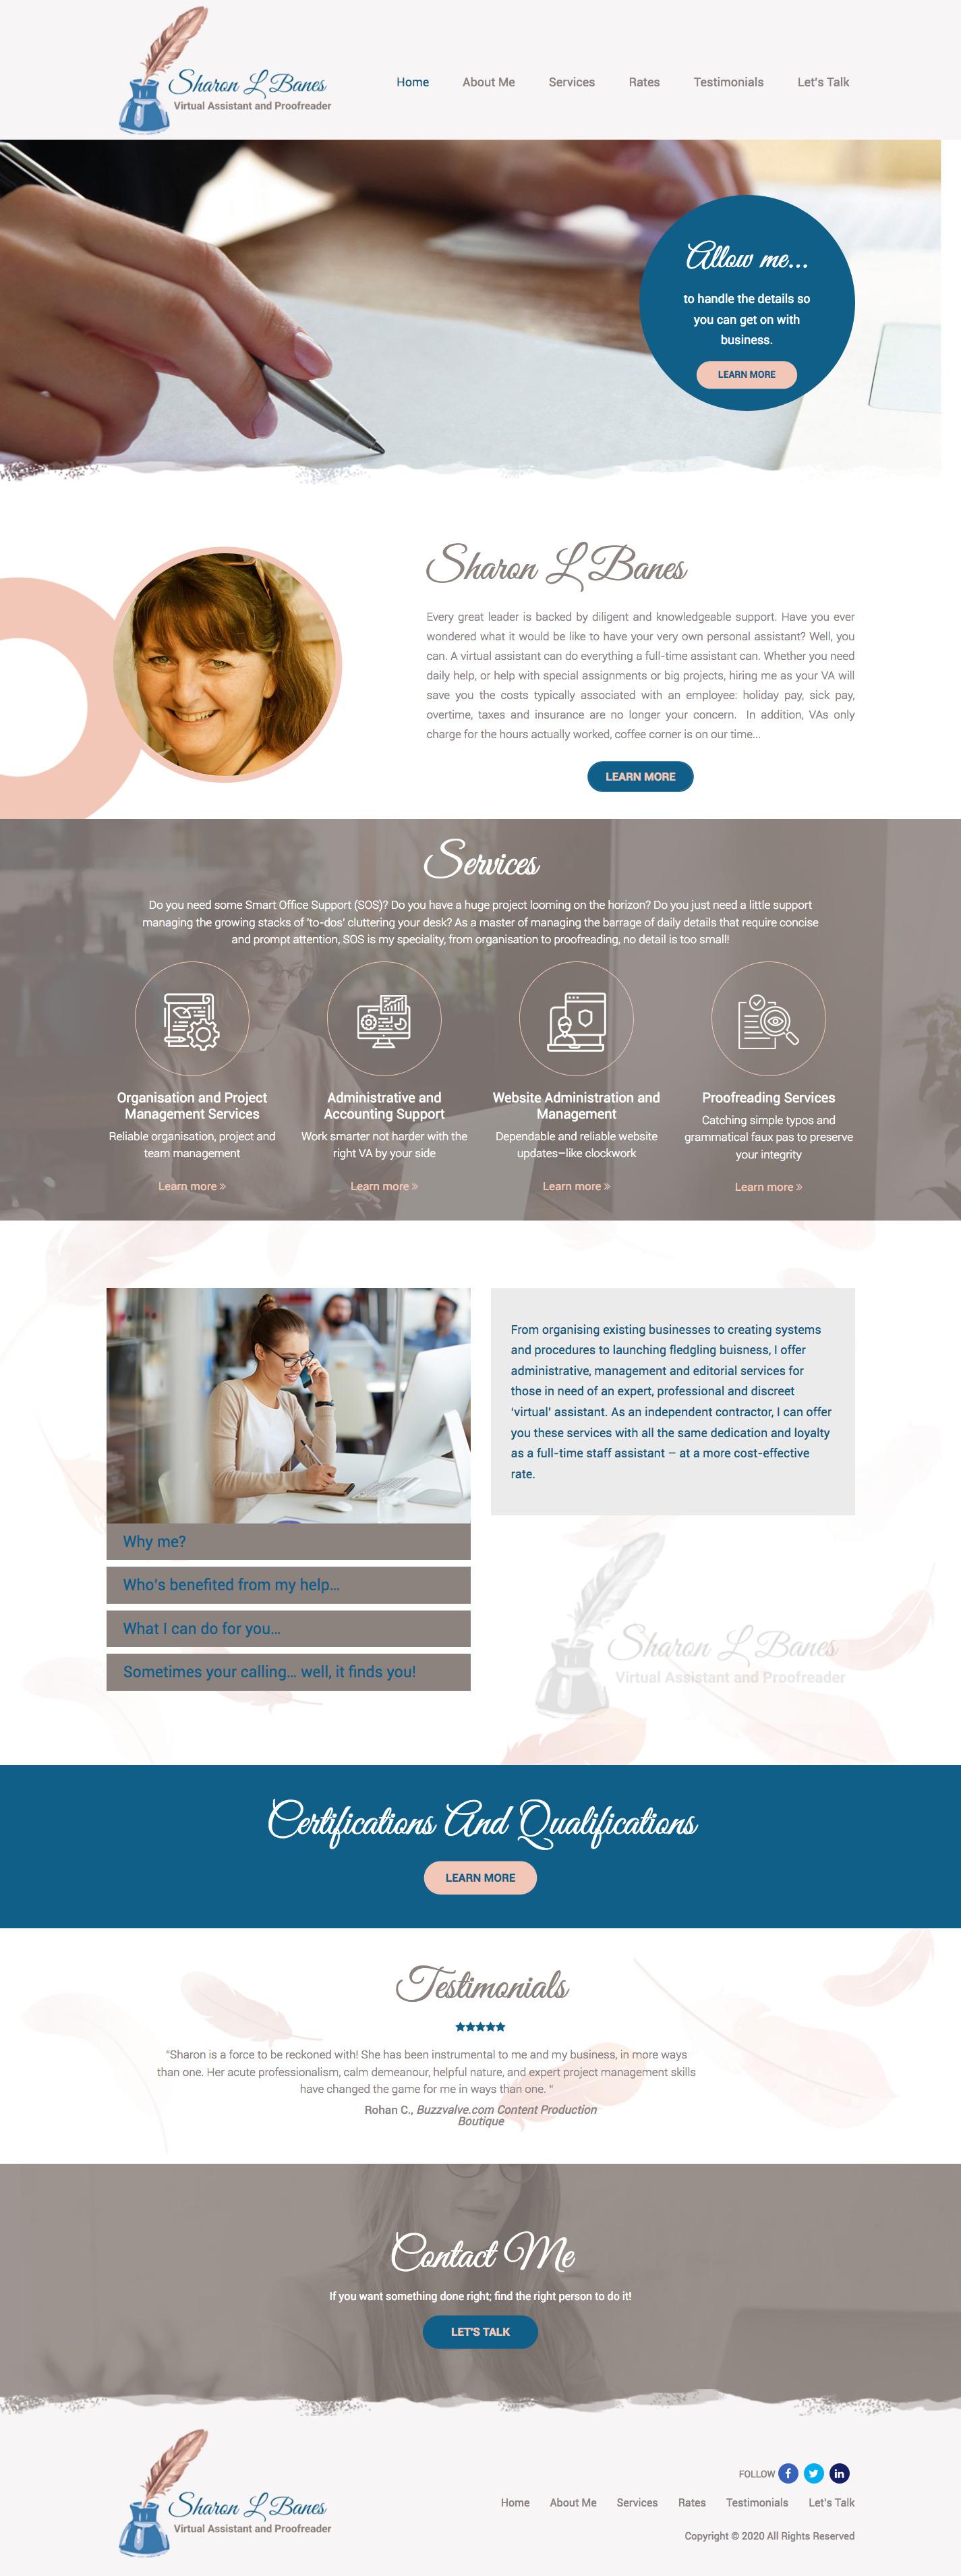 Web Design For A Company By Pb Design 24493555